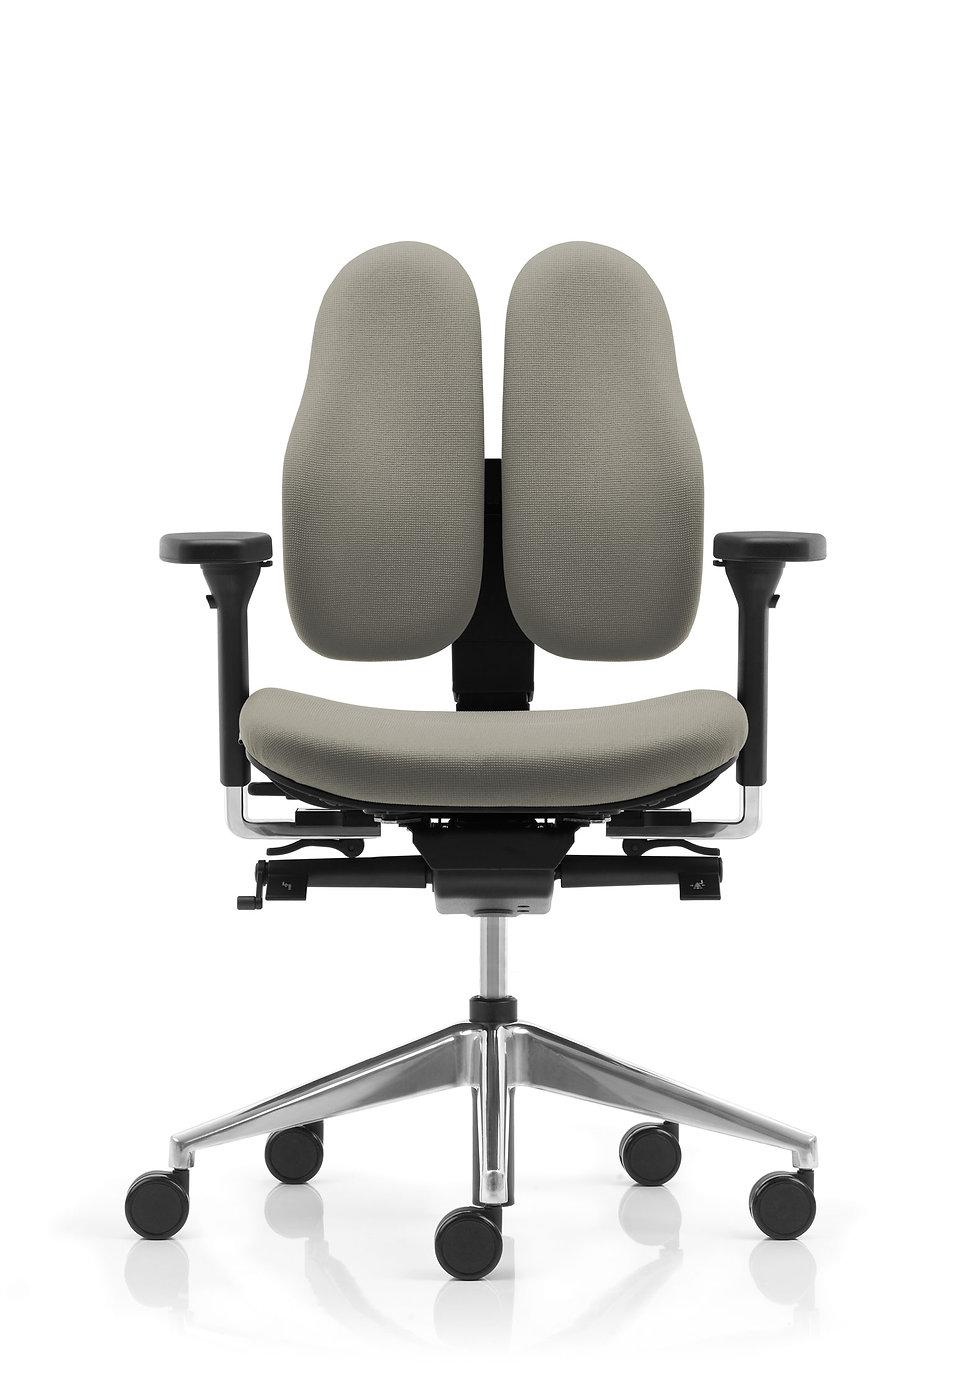 DuoBack_Type_11_Office_Chair_50%.jpg